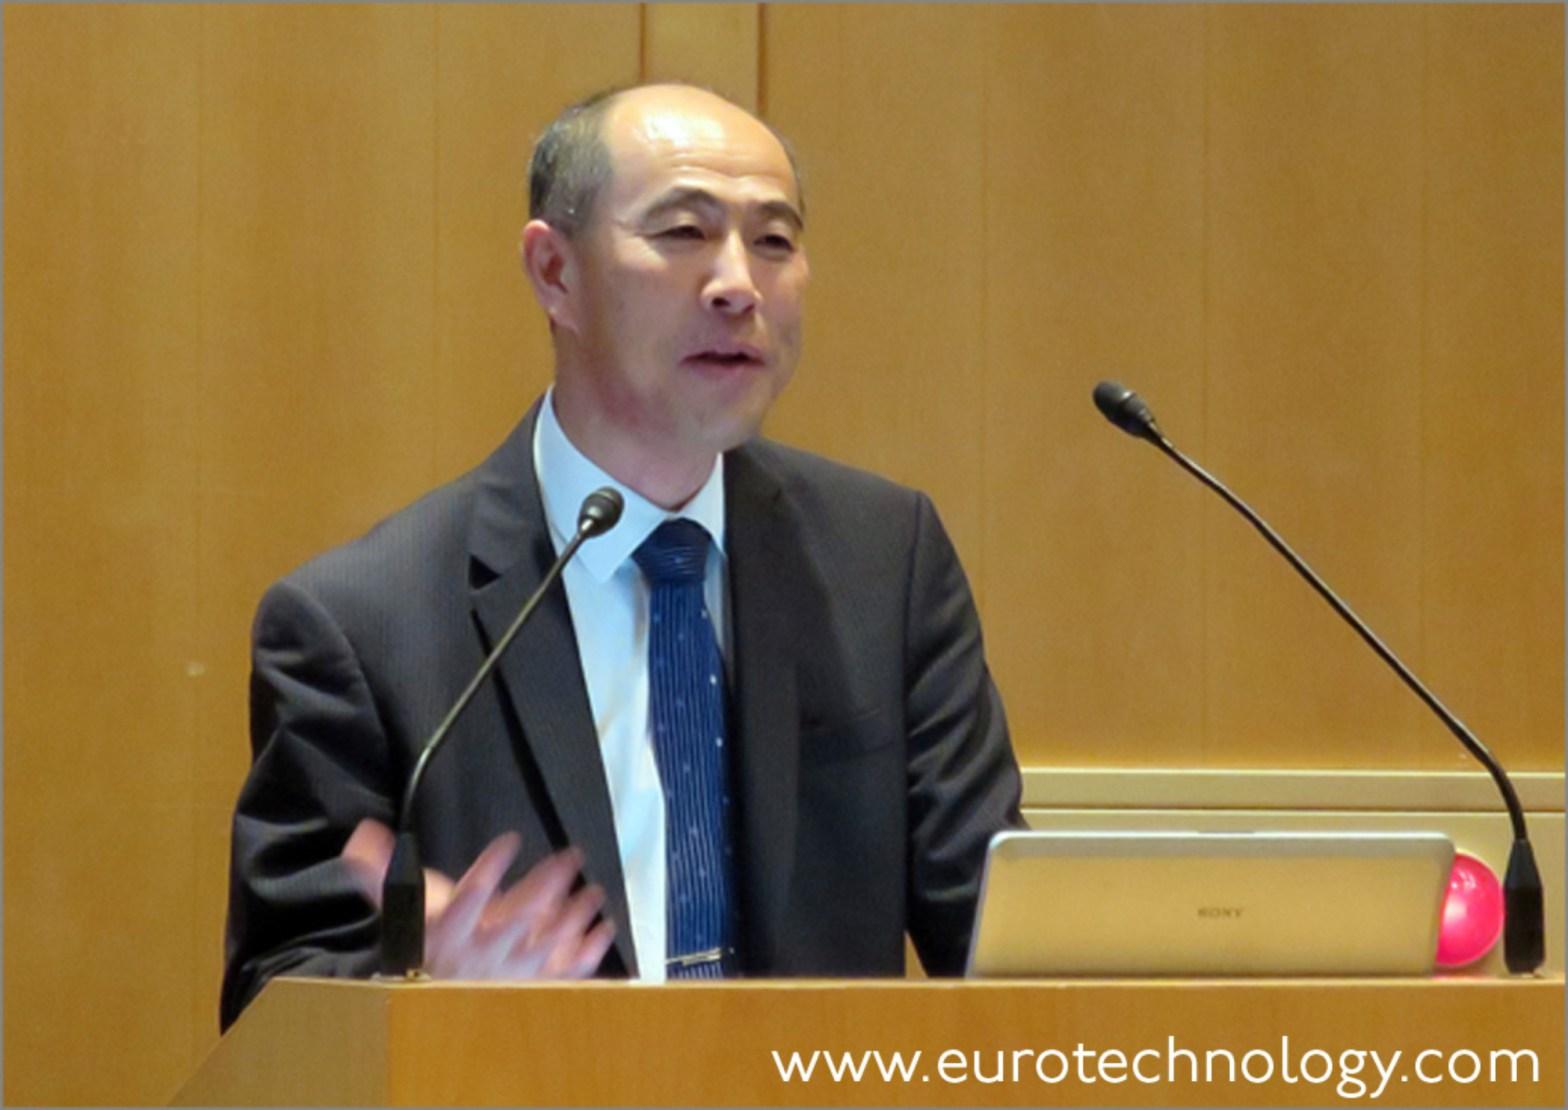 Takeo Hoshi Stanford University Abenomics